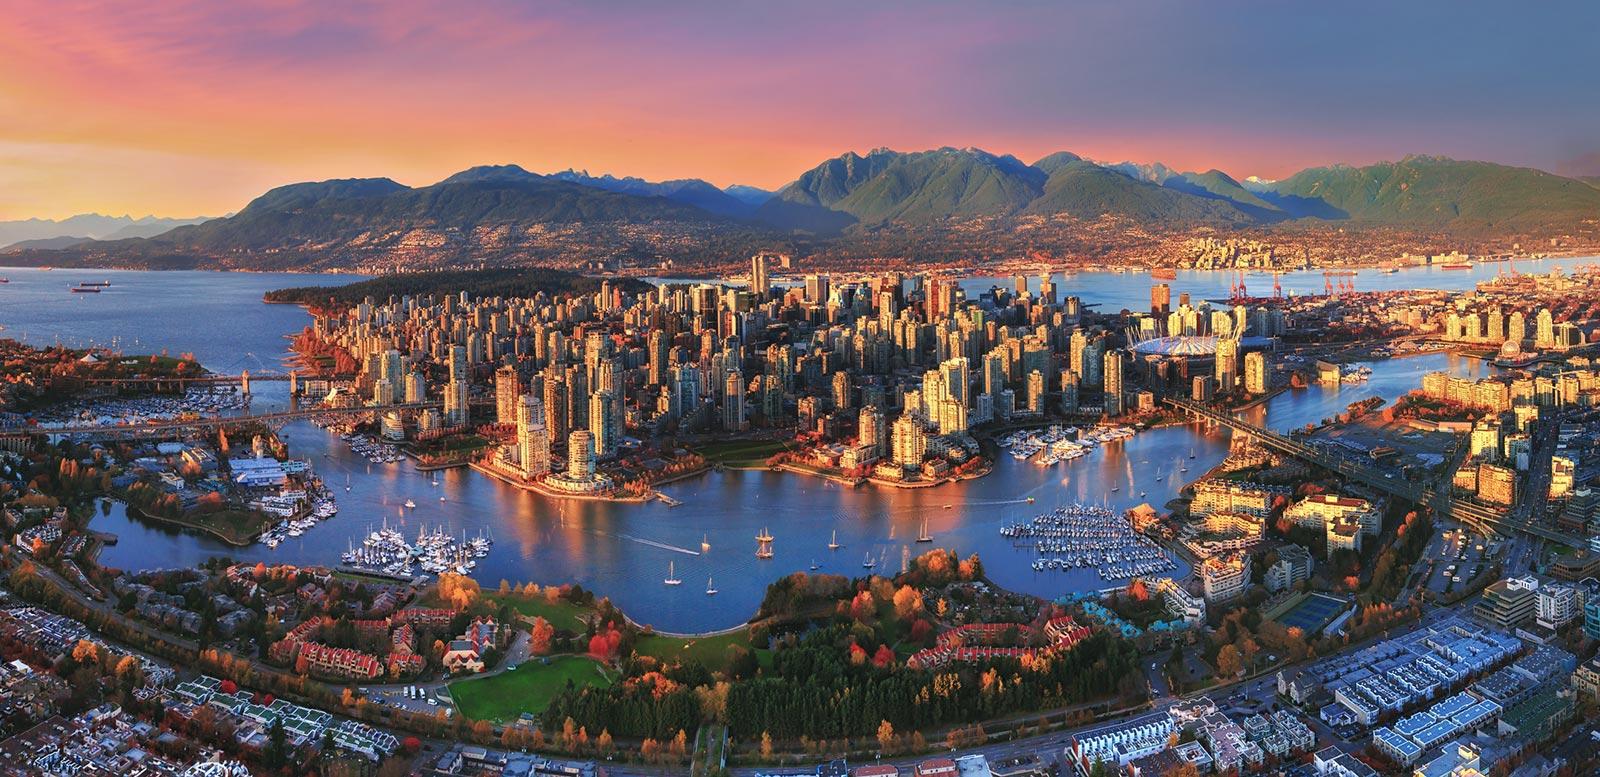 vancouver-kanada-dil-egitimi-kursu-6.jpg